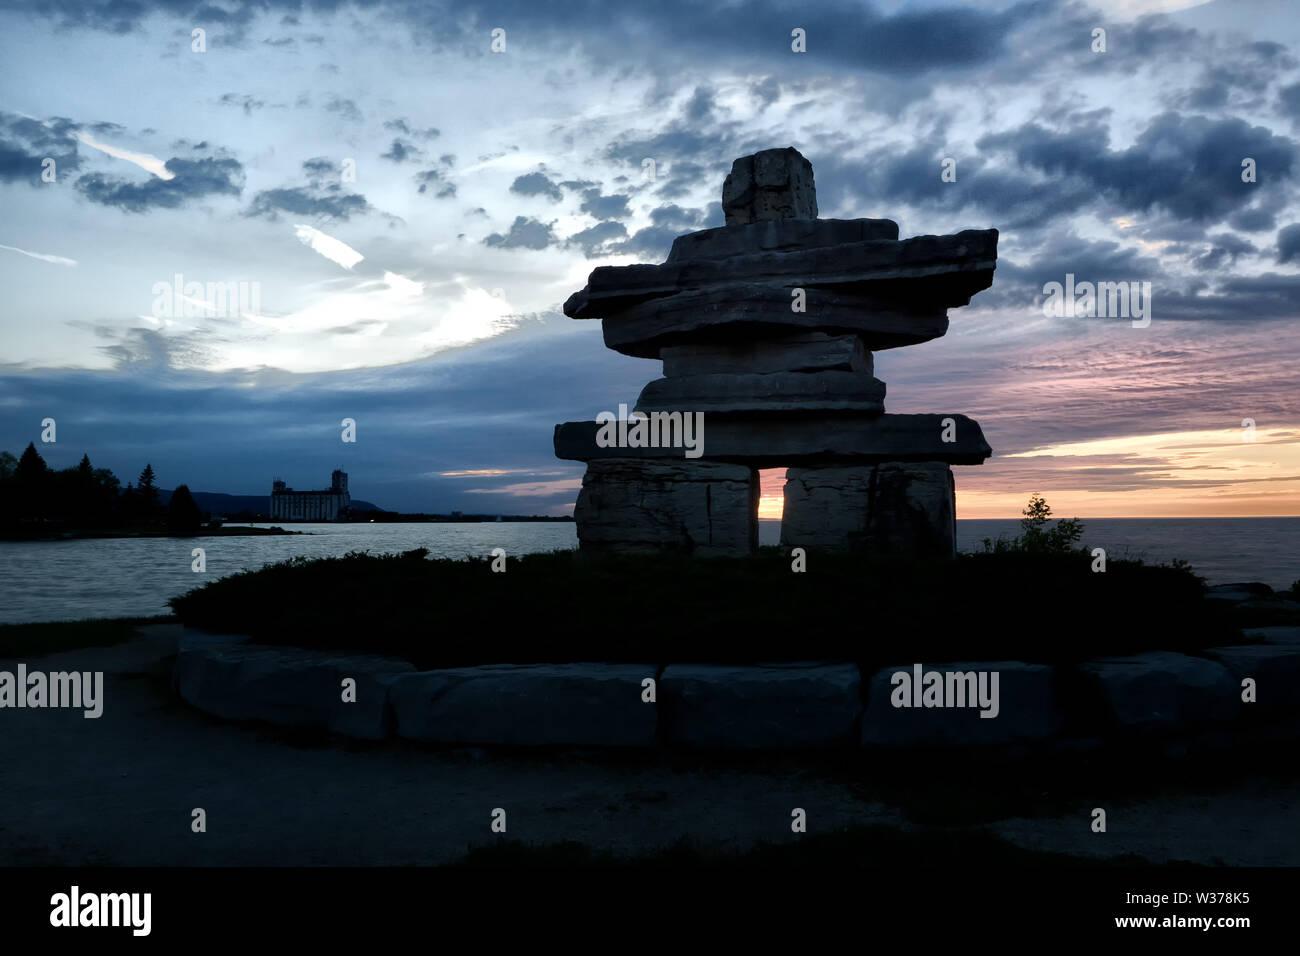 Canada Ontario Collingwood, Inukshuk at Sunset Point at Sunset Point at Sunset, Juni 2019, Inushuk Stone Landmark, We were Here, Stockfoto